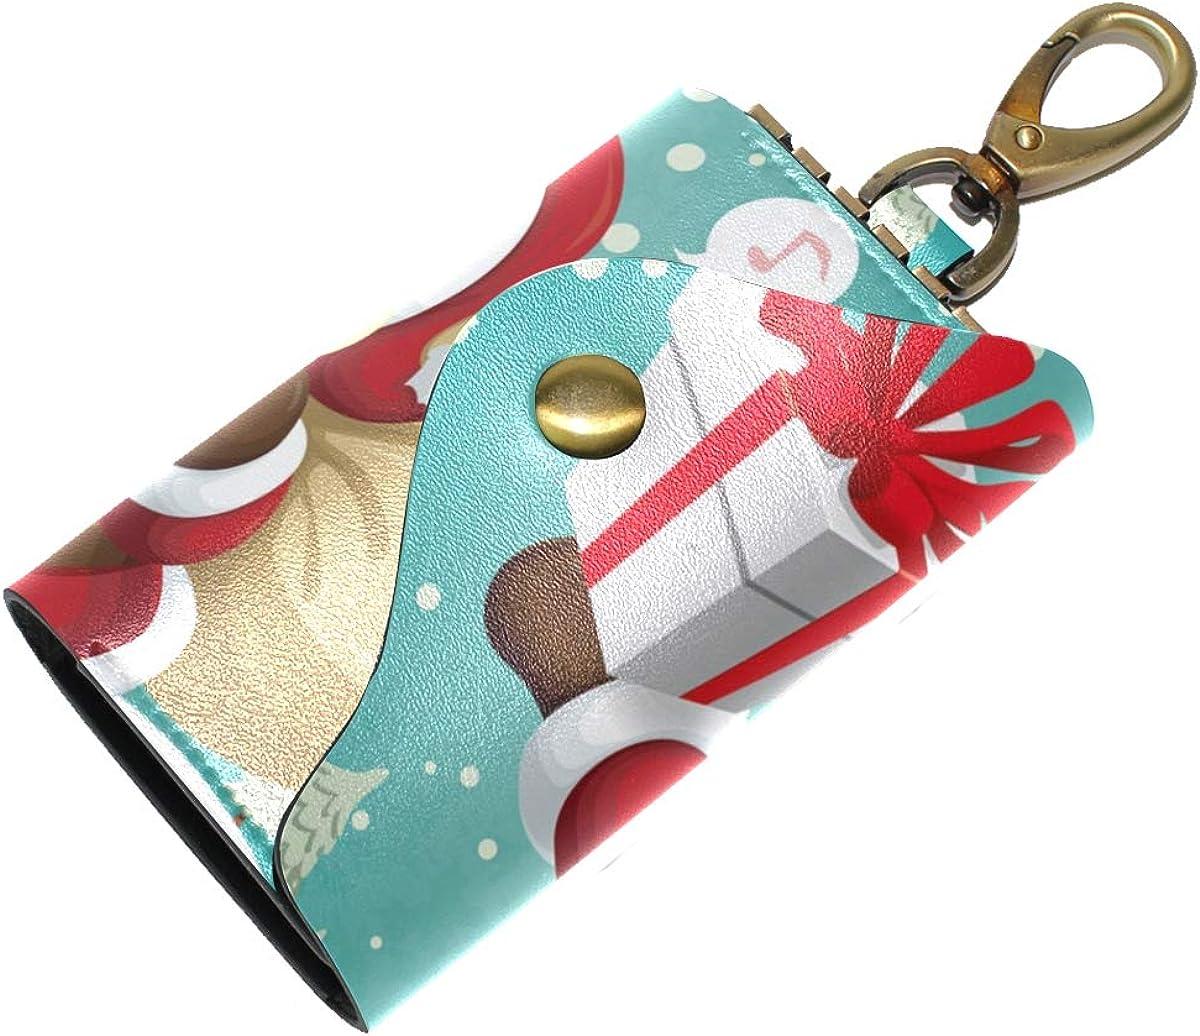 KEAKIA Vintage Christmas Poster Design Leather Key Case Wallets Tri-fold Key Holder Keychains with 6 Hooks 2 Slot Snap Closure for Men Women